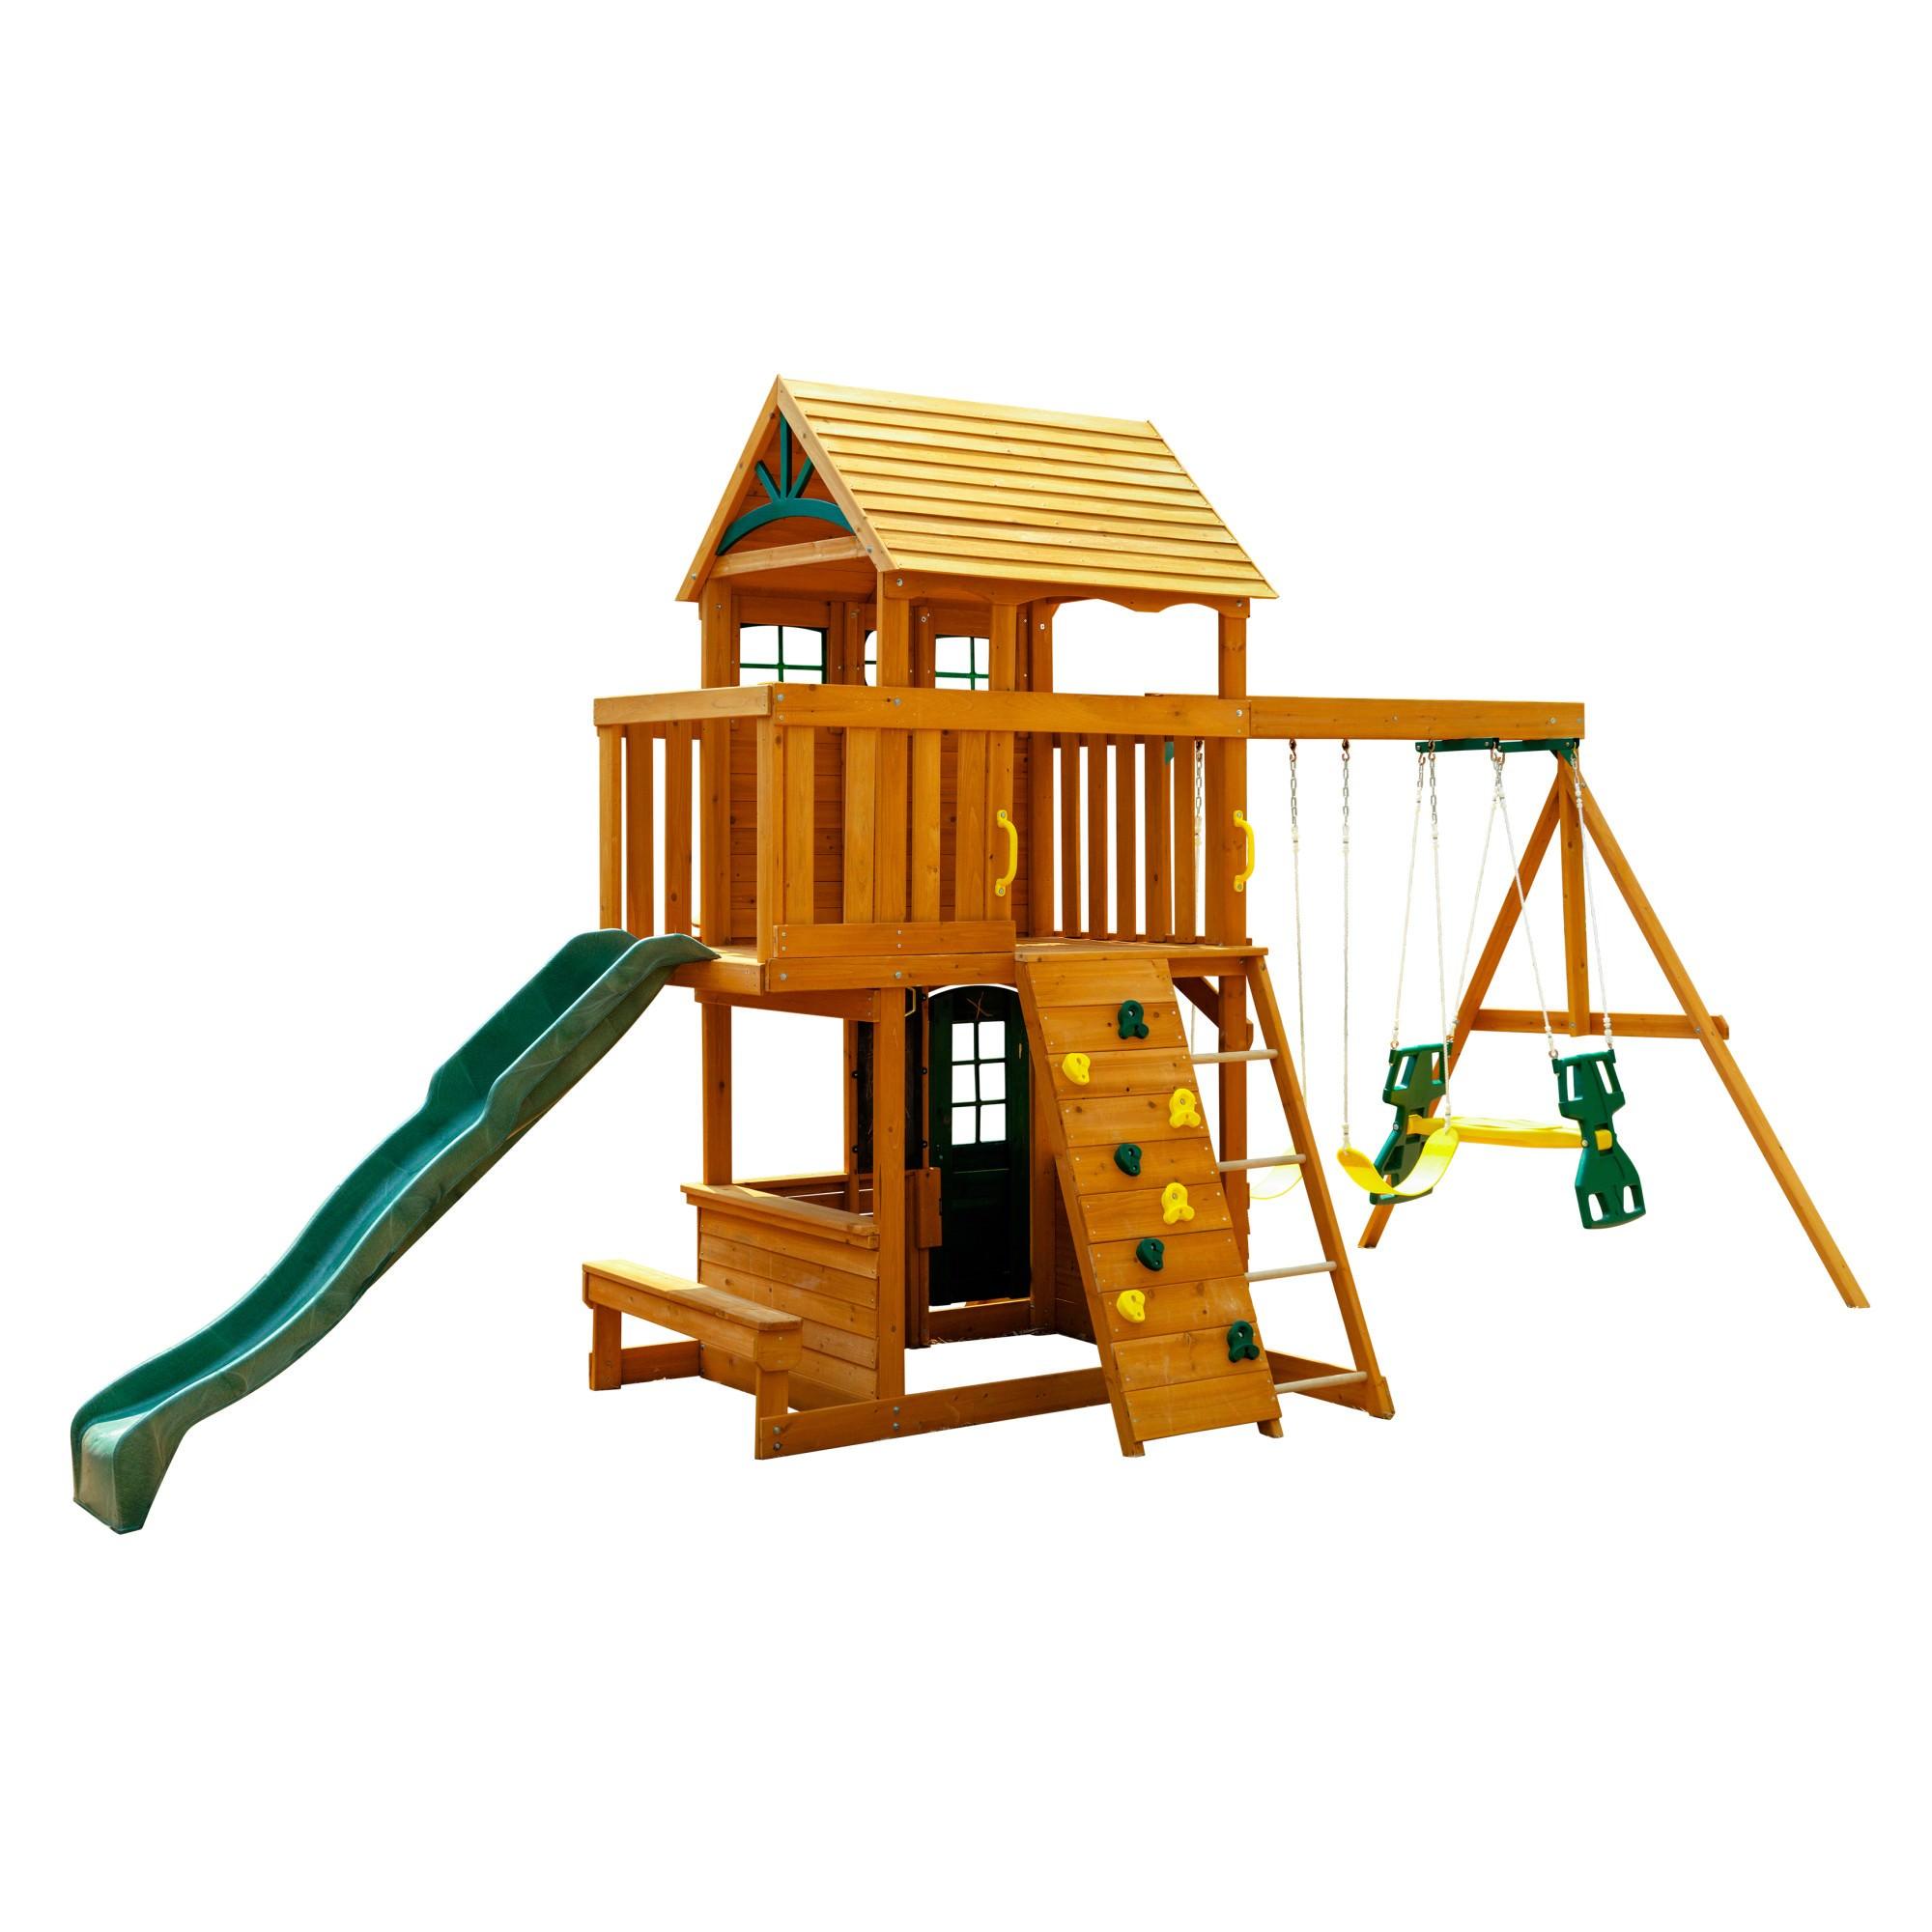 KidKraft Ashberry Wooden Playset